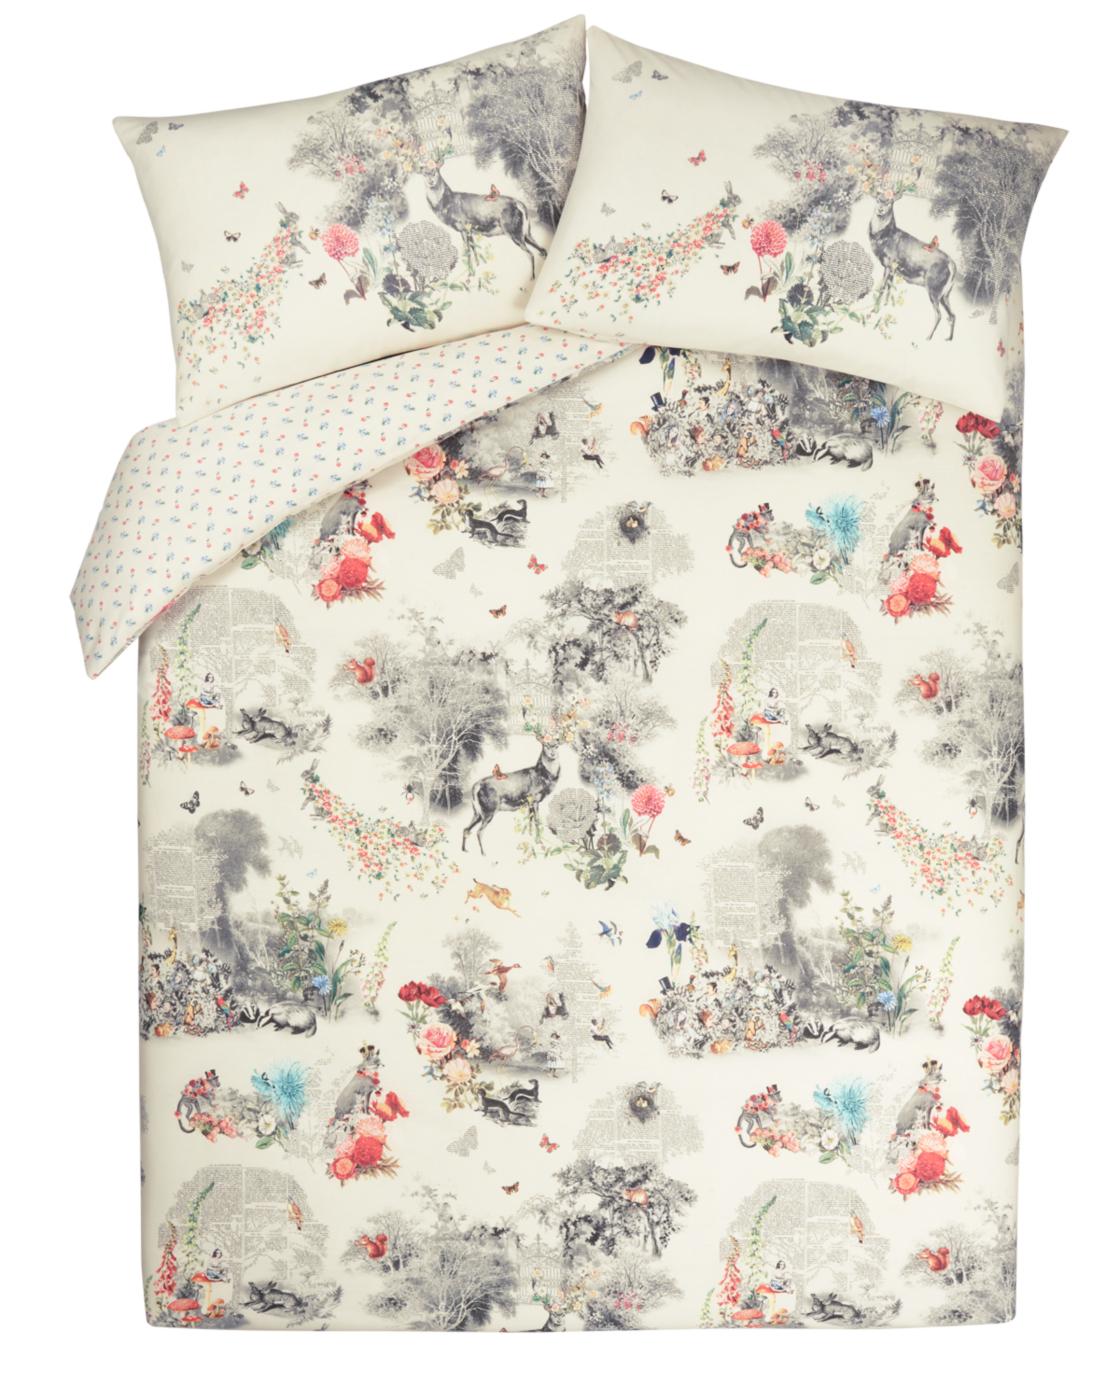 Fairytale Bedroom Set Duvet Covers